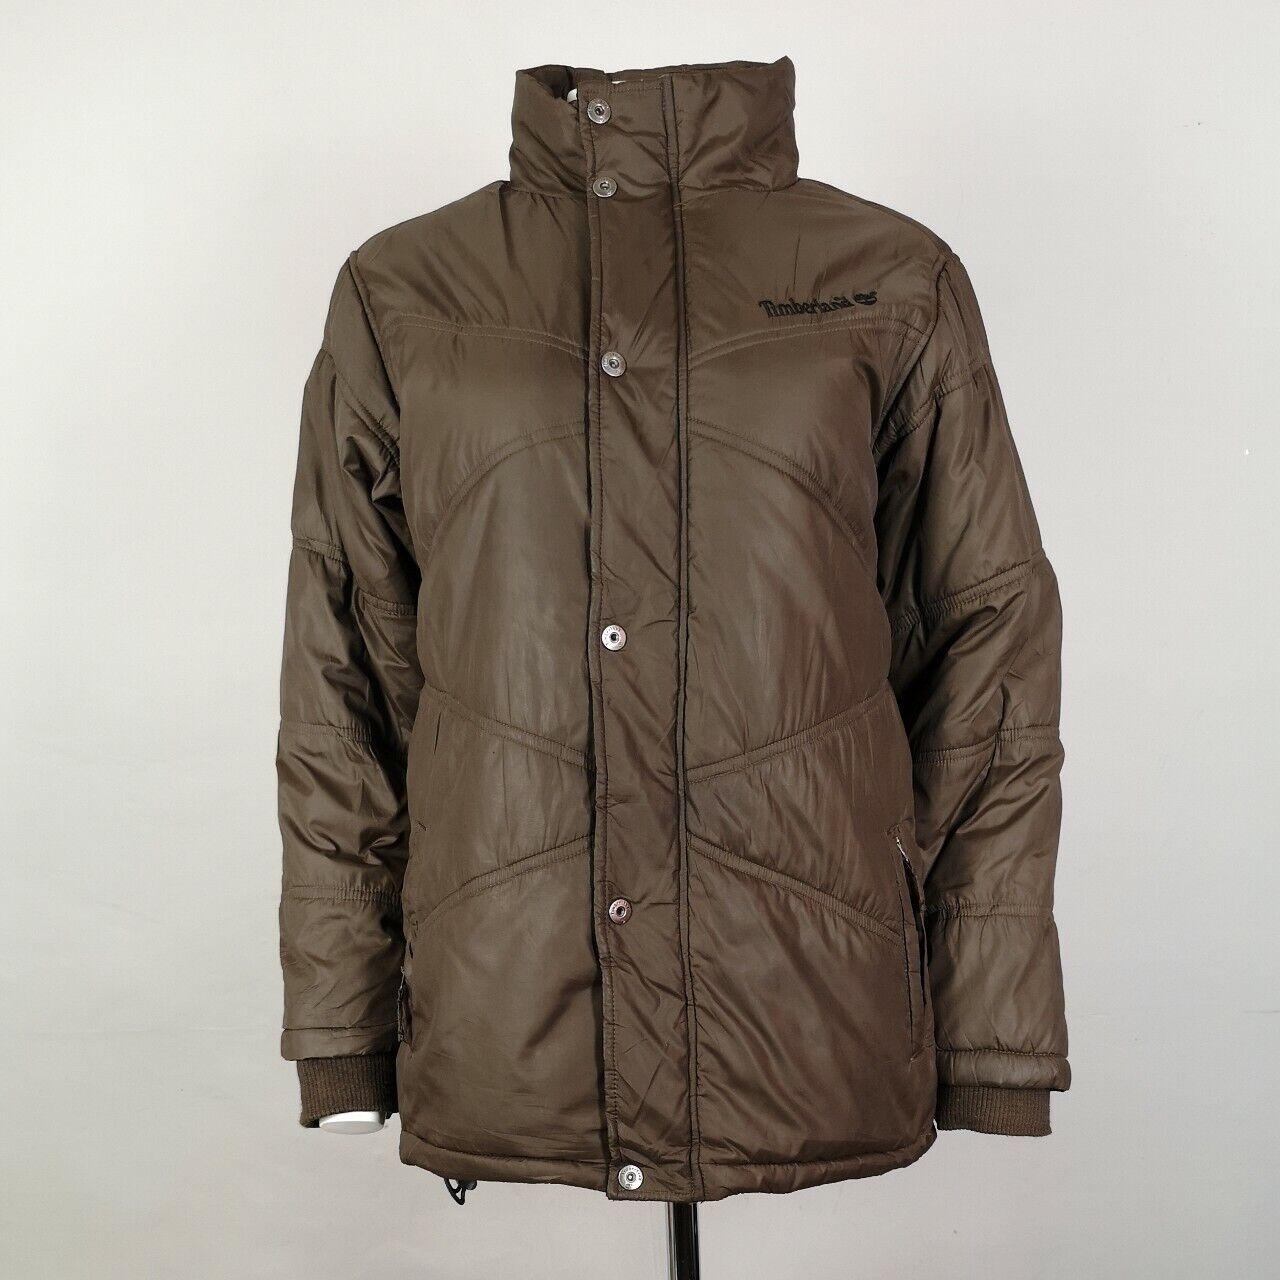 A tiempo Kilómetros secretamente  Women's Timberland Puffer Jacket With Fleece Lining In Brown Size UK 12    eBay